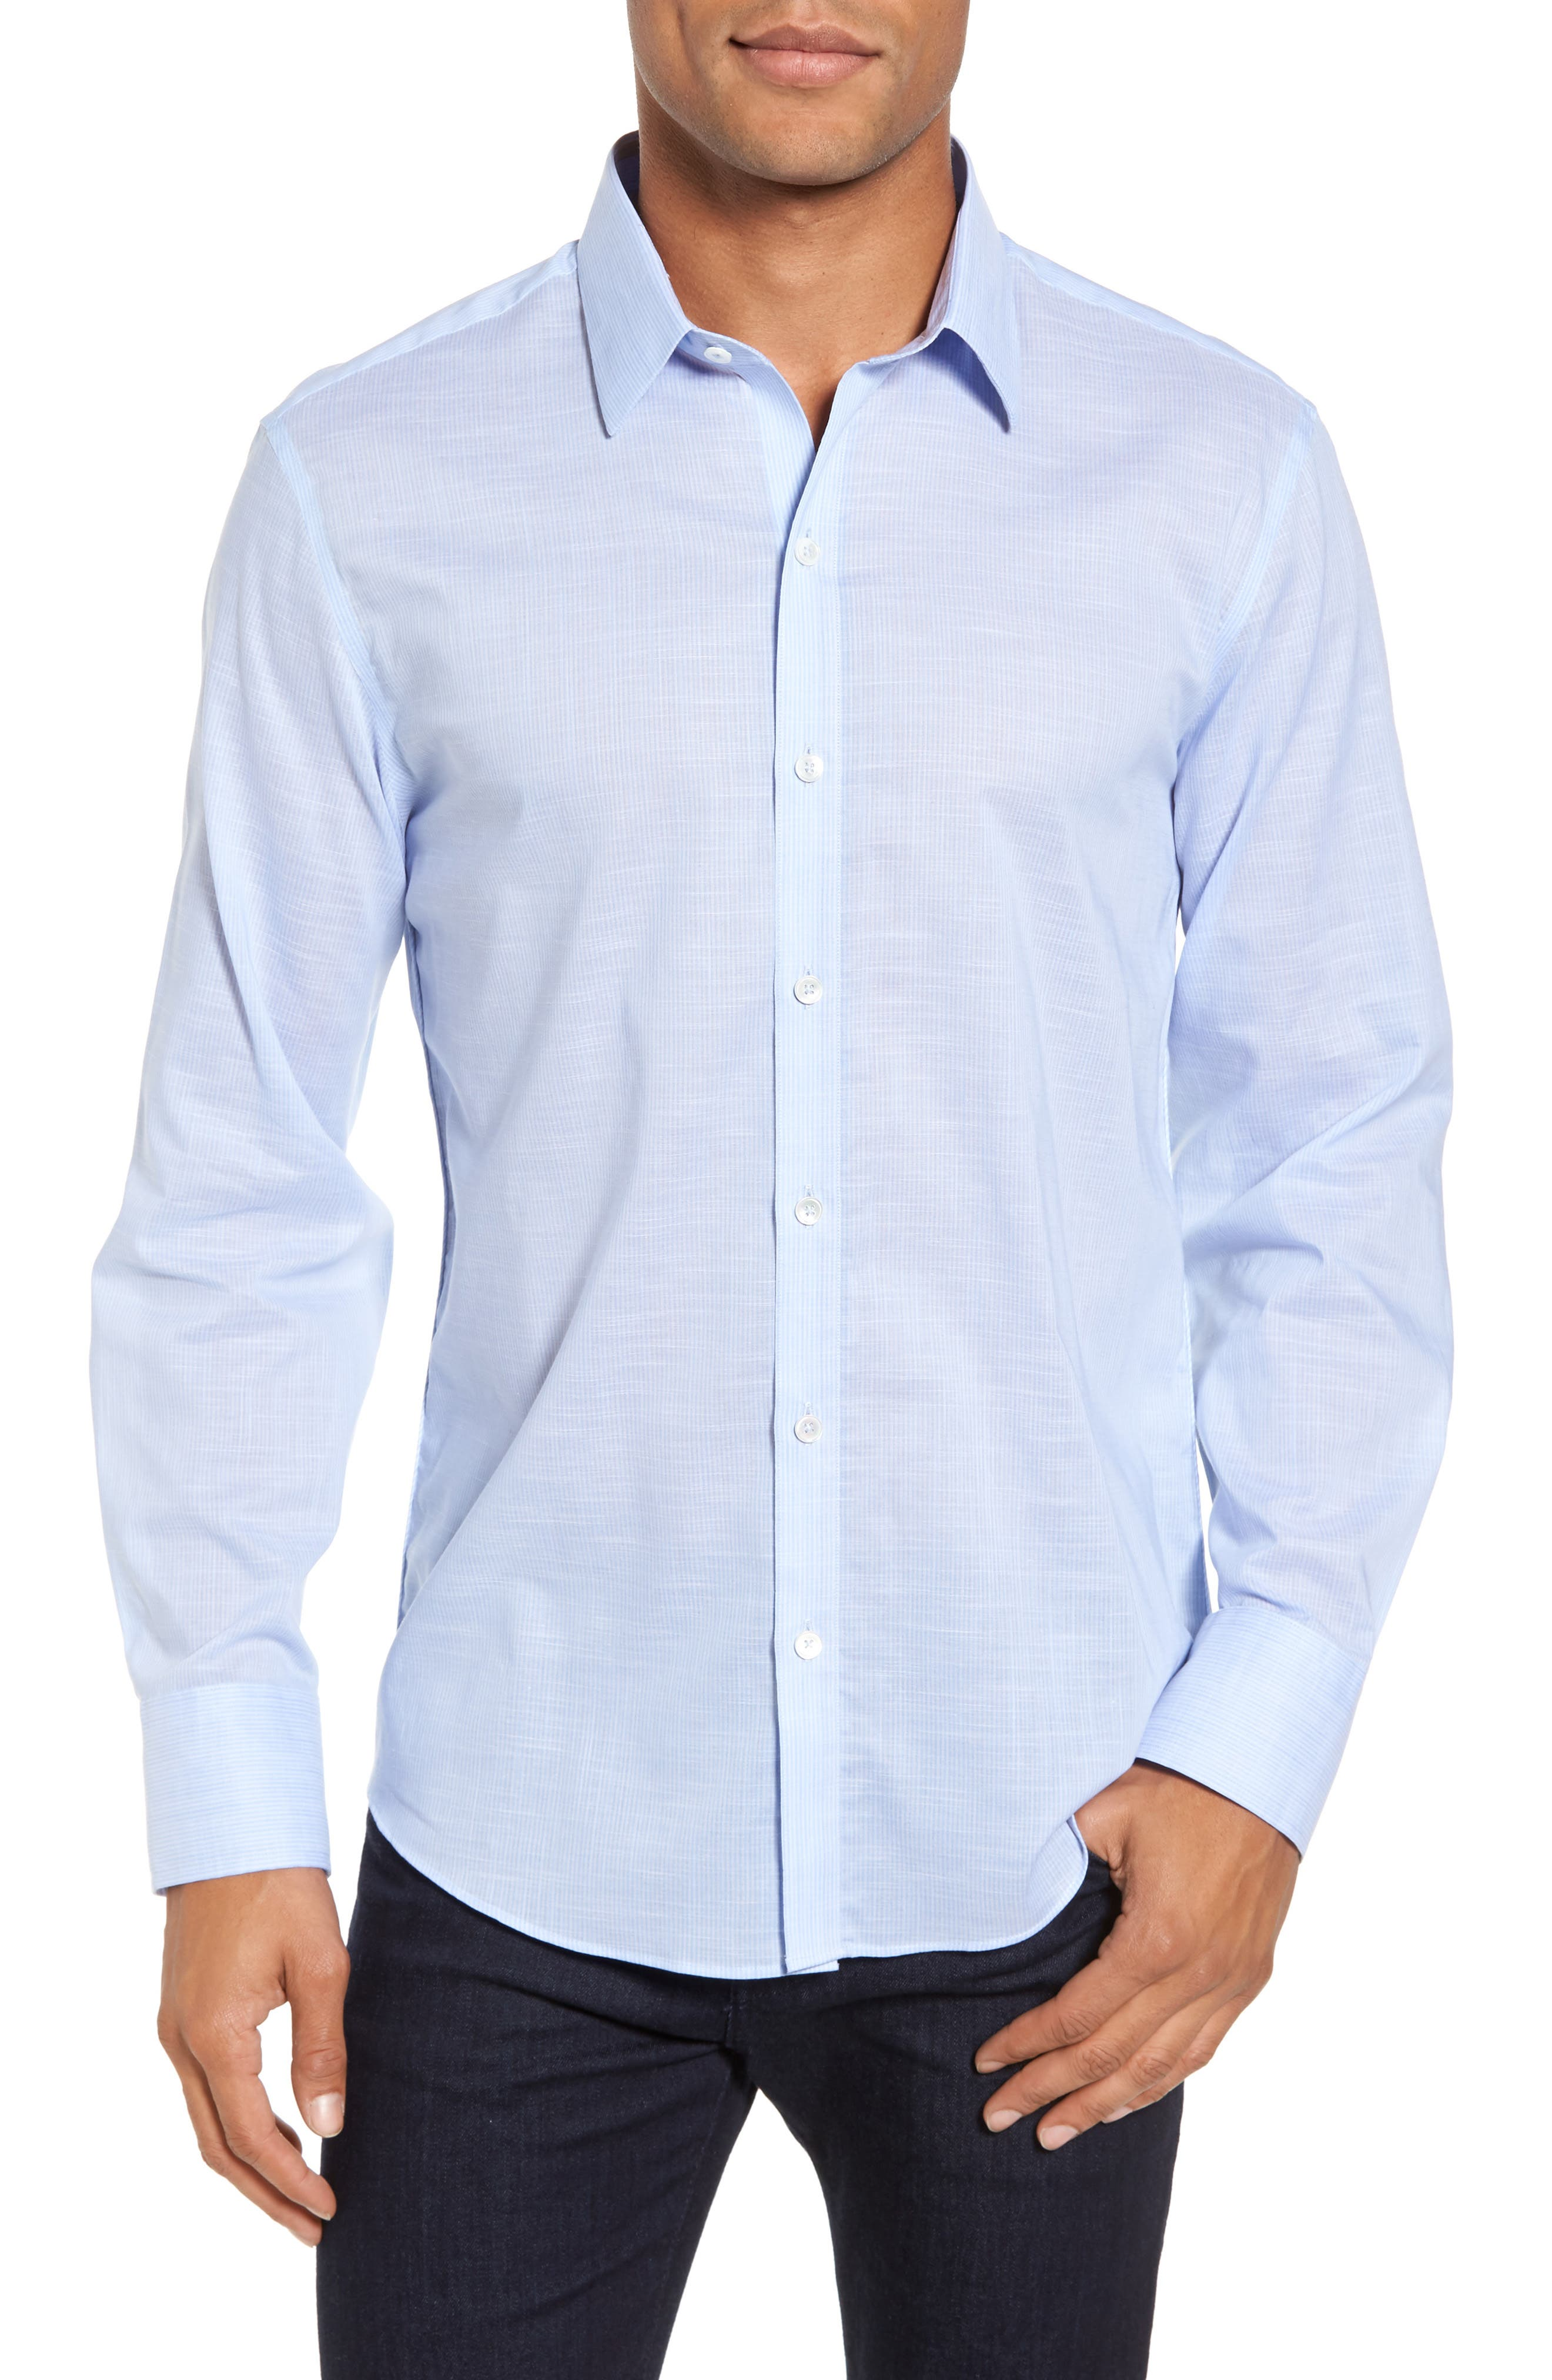 Main Image - Zachary Prell Ridley Slim Fit Texture Sport Shirt